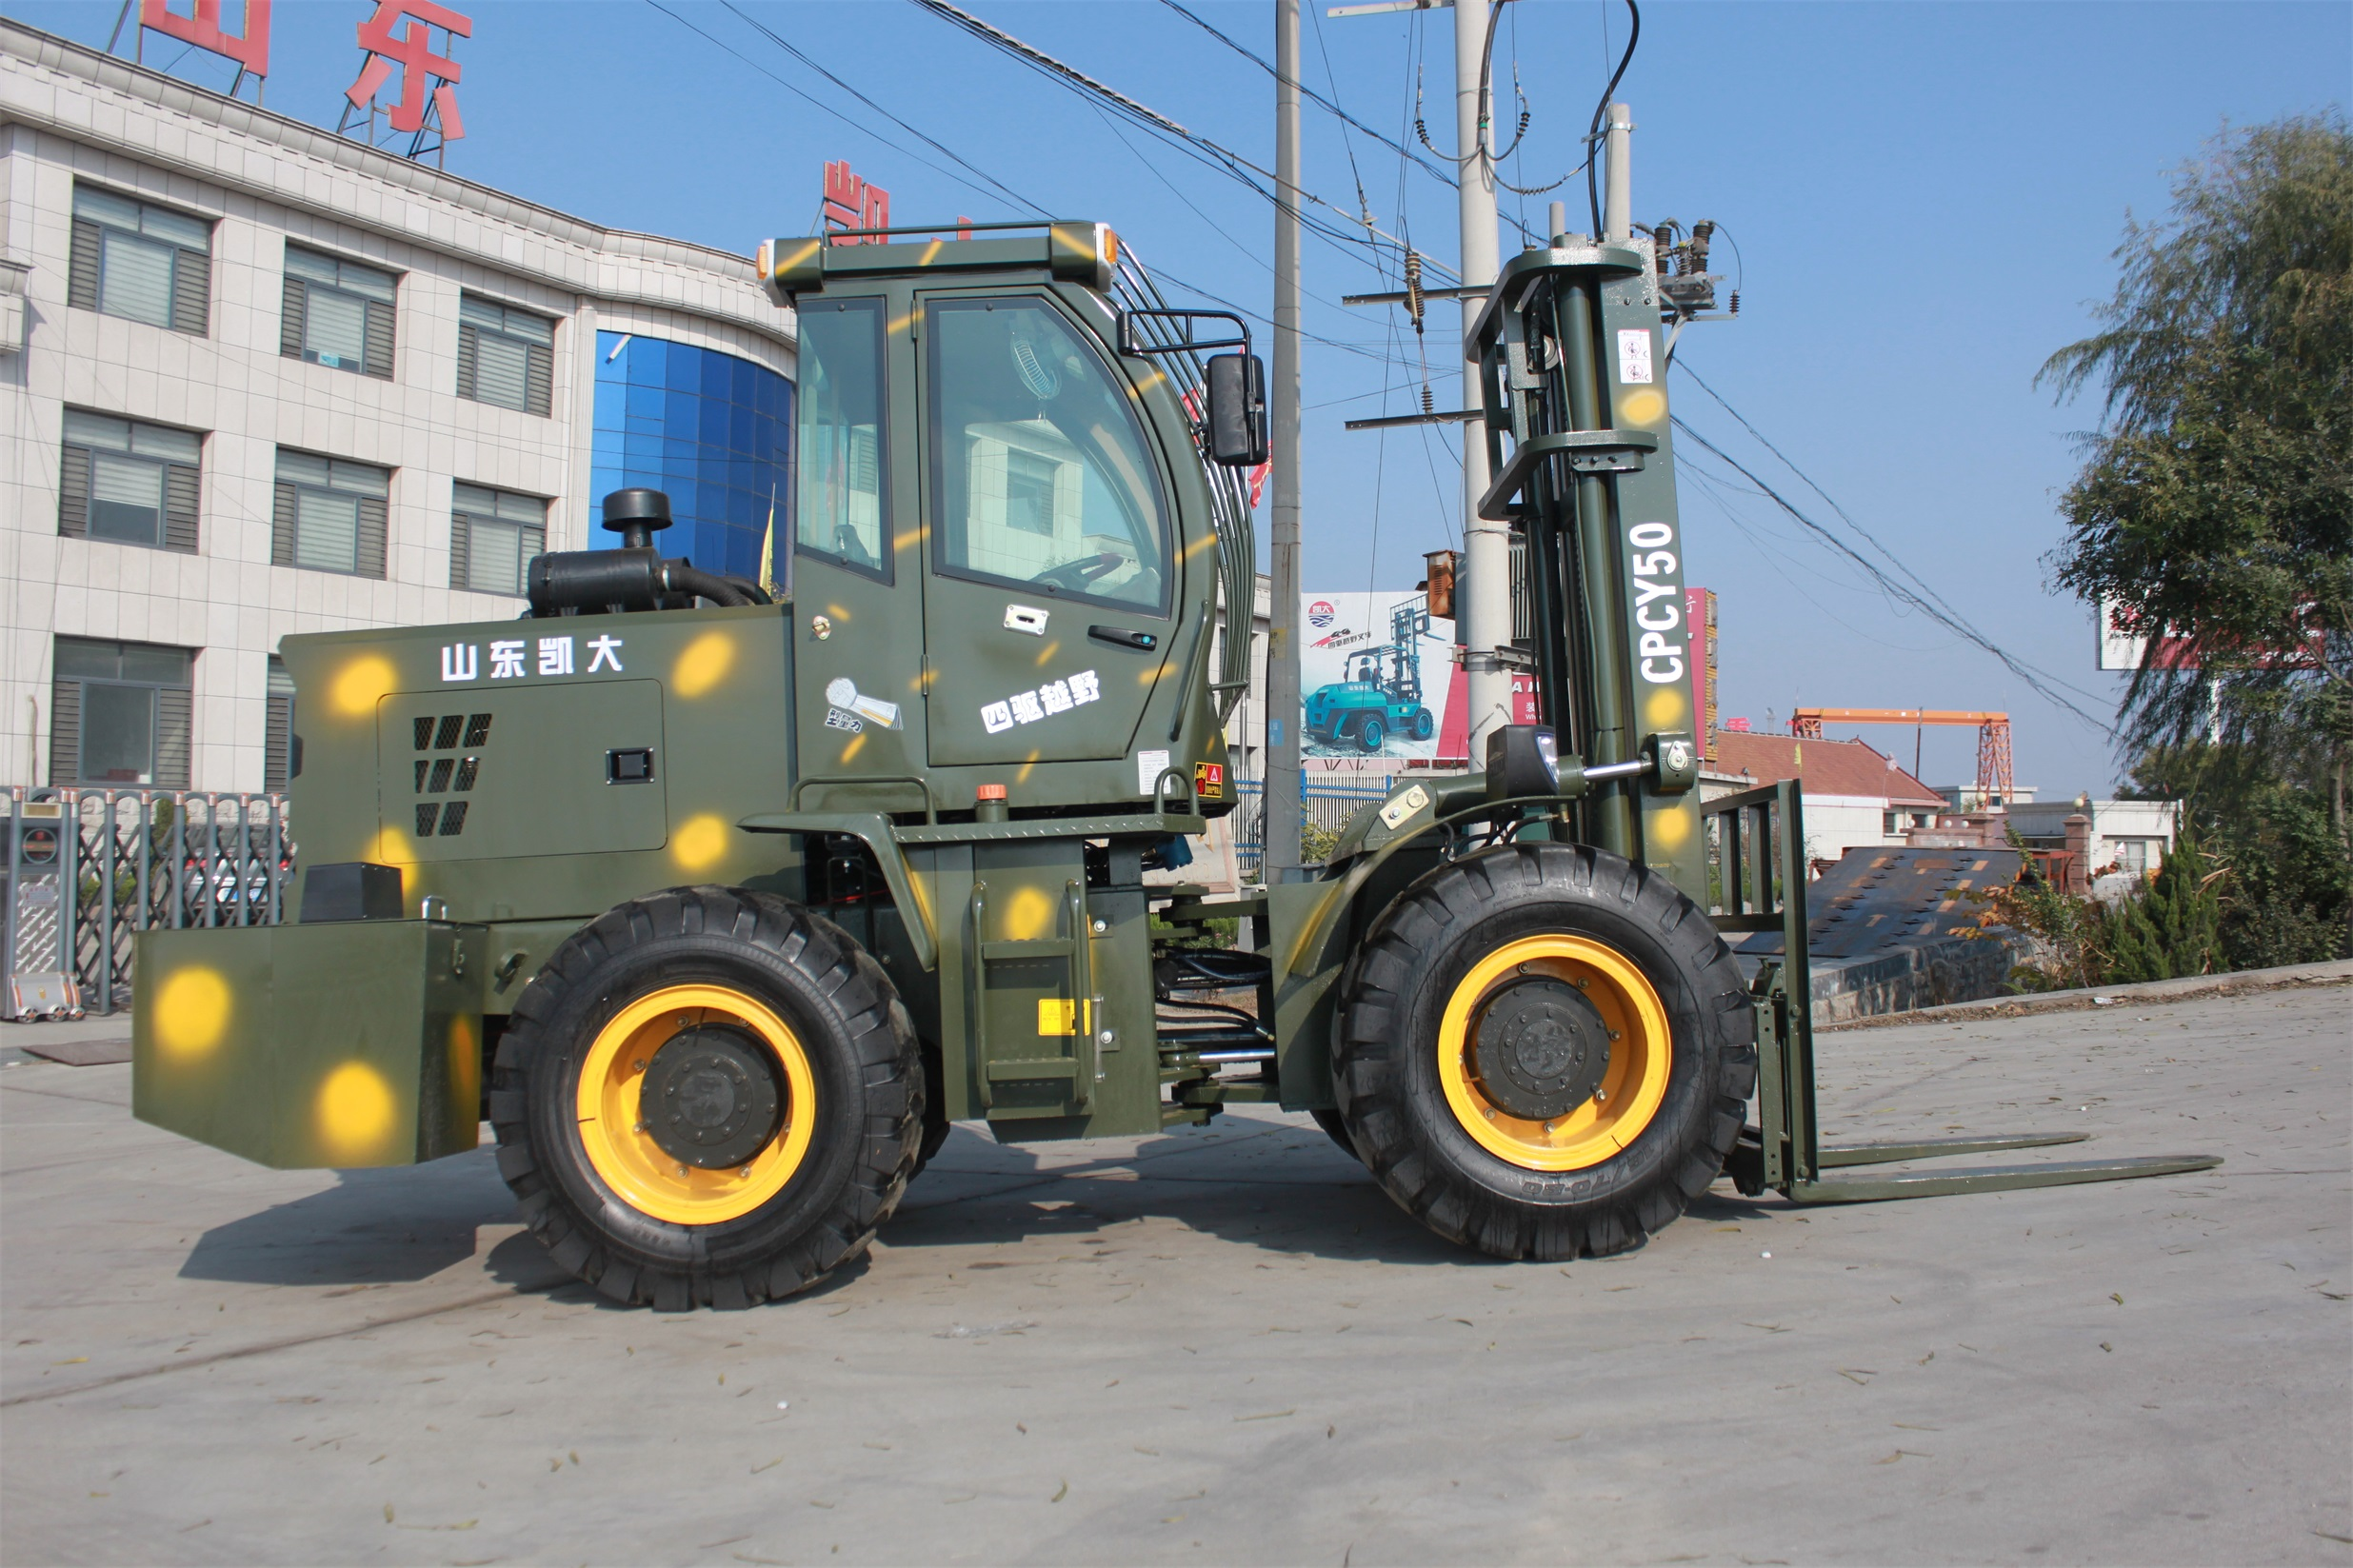 Wheel Loader (Zl-16) at Best Price in Laizhou, Shandong